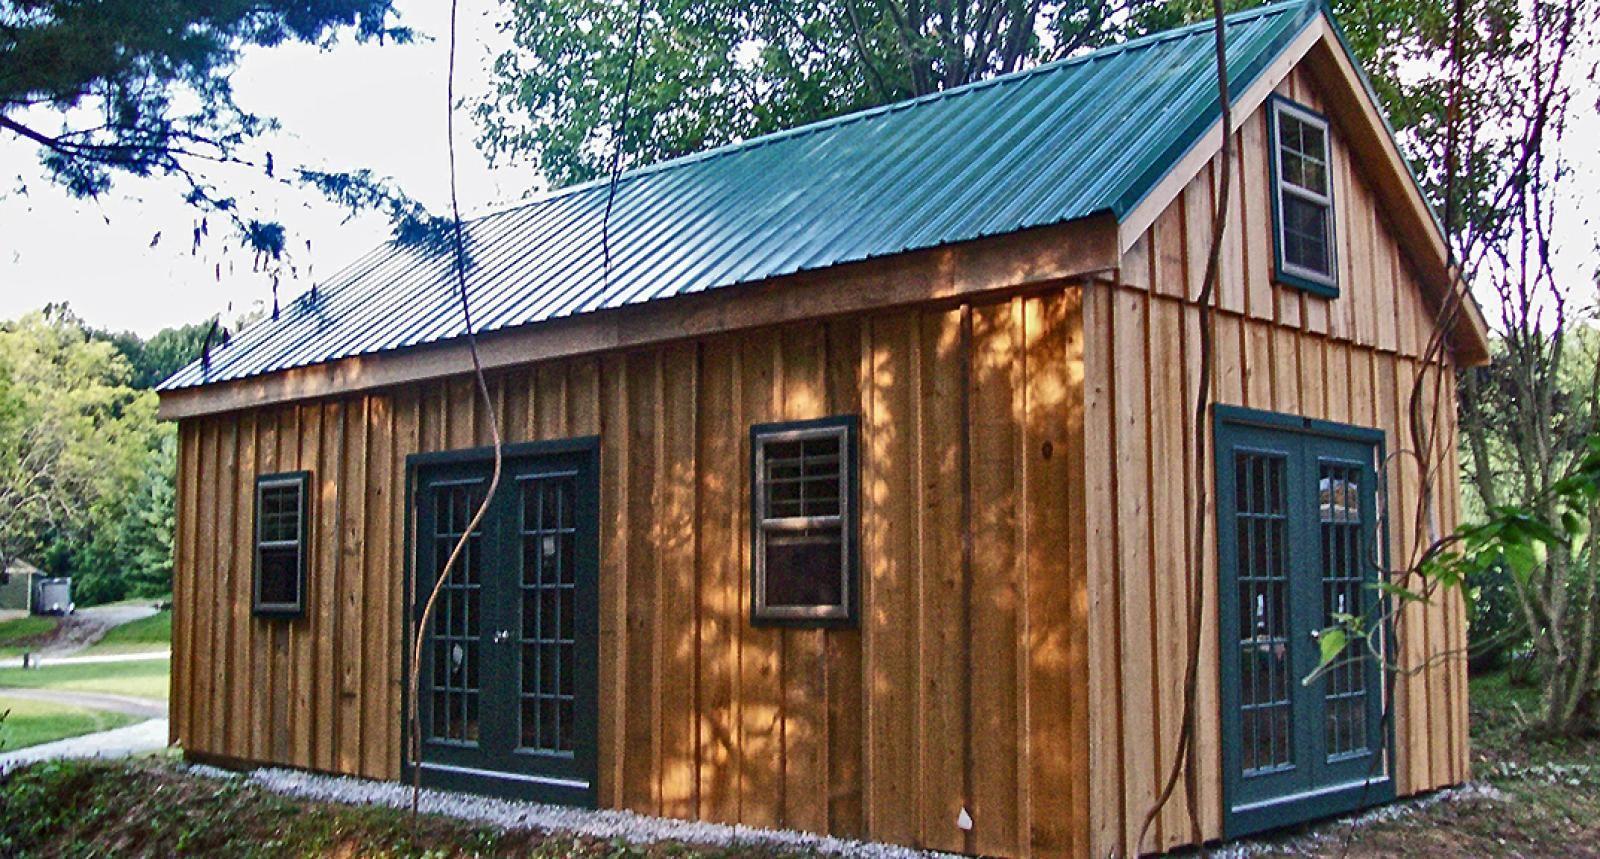 Pine Board Batten Garages Horizon Structures Cabin 1 Colors